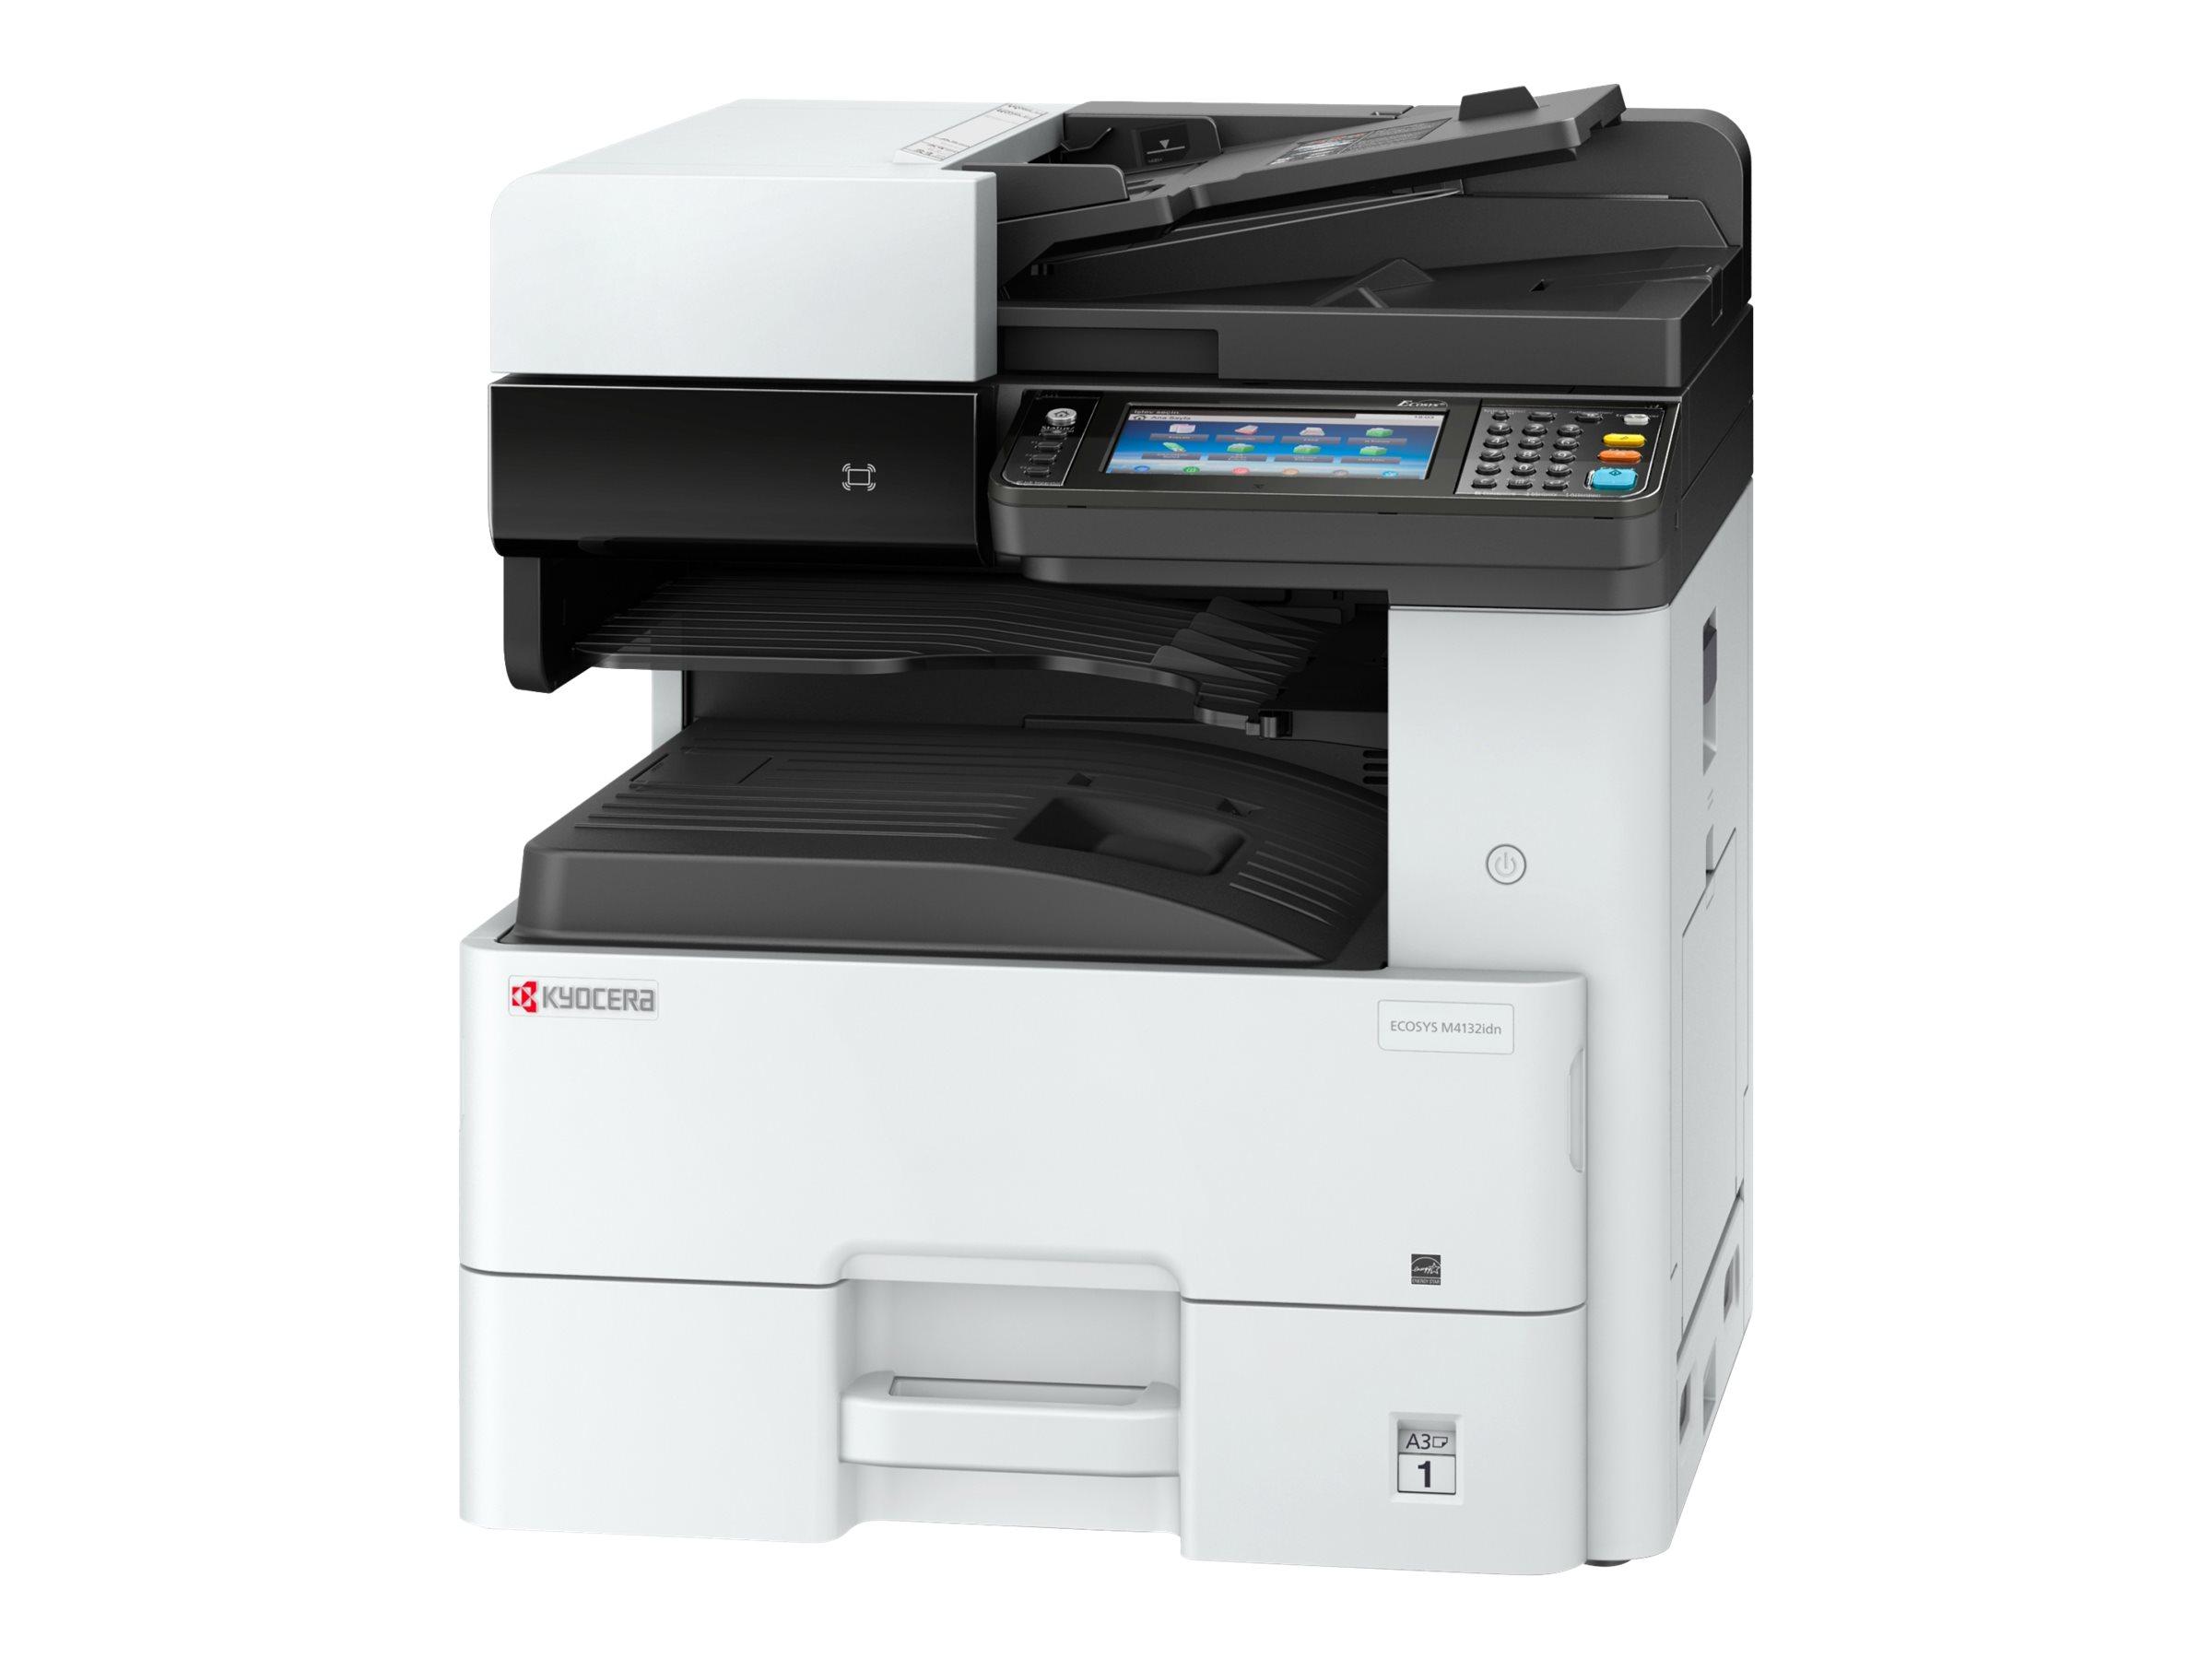 Kyocera ECOSYS M4132idn - Multifunktionsdrucker